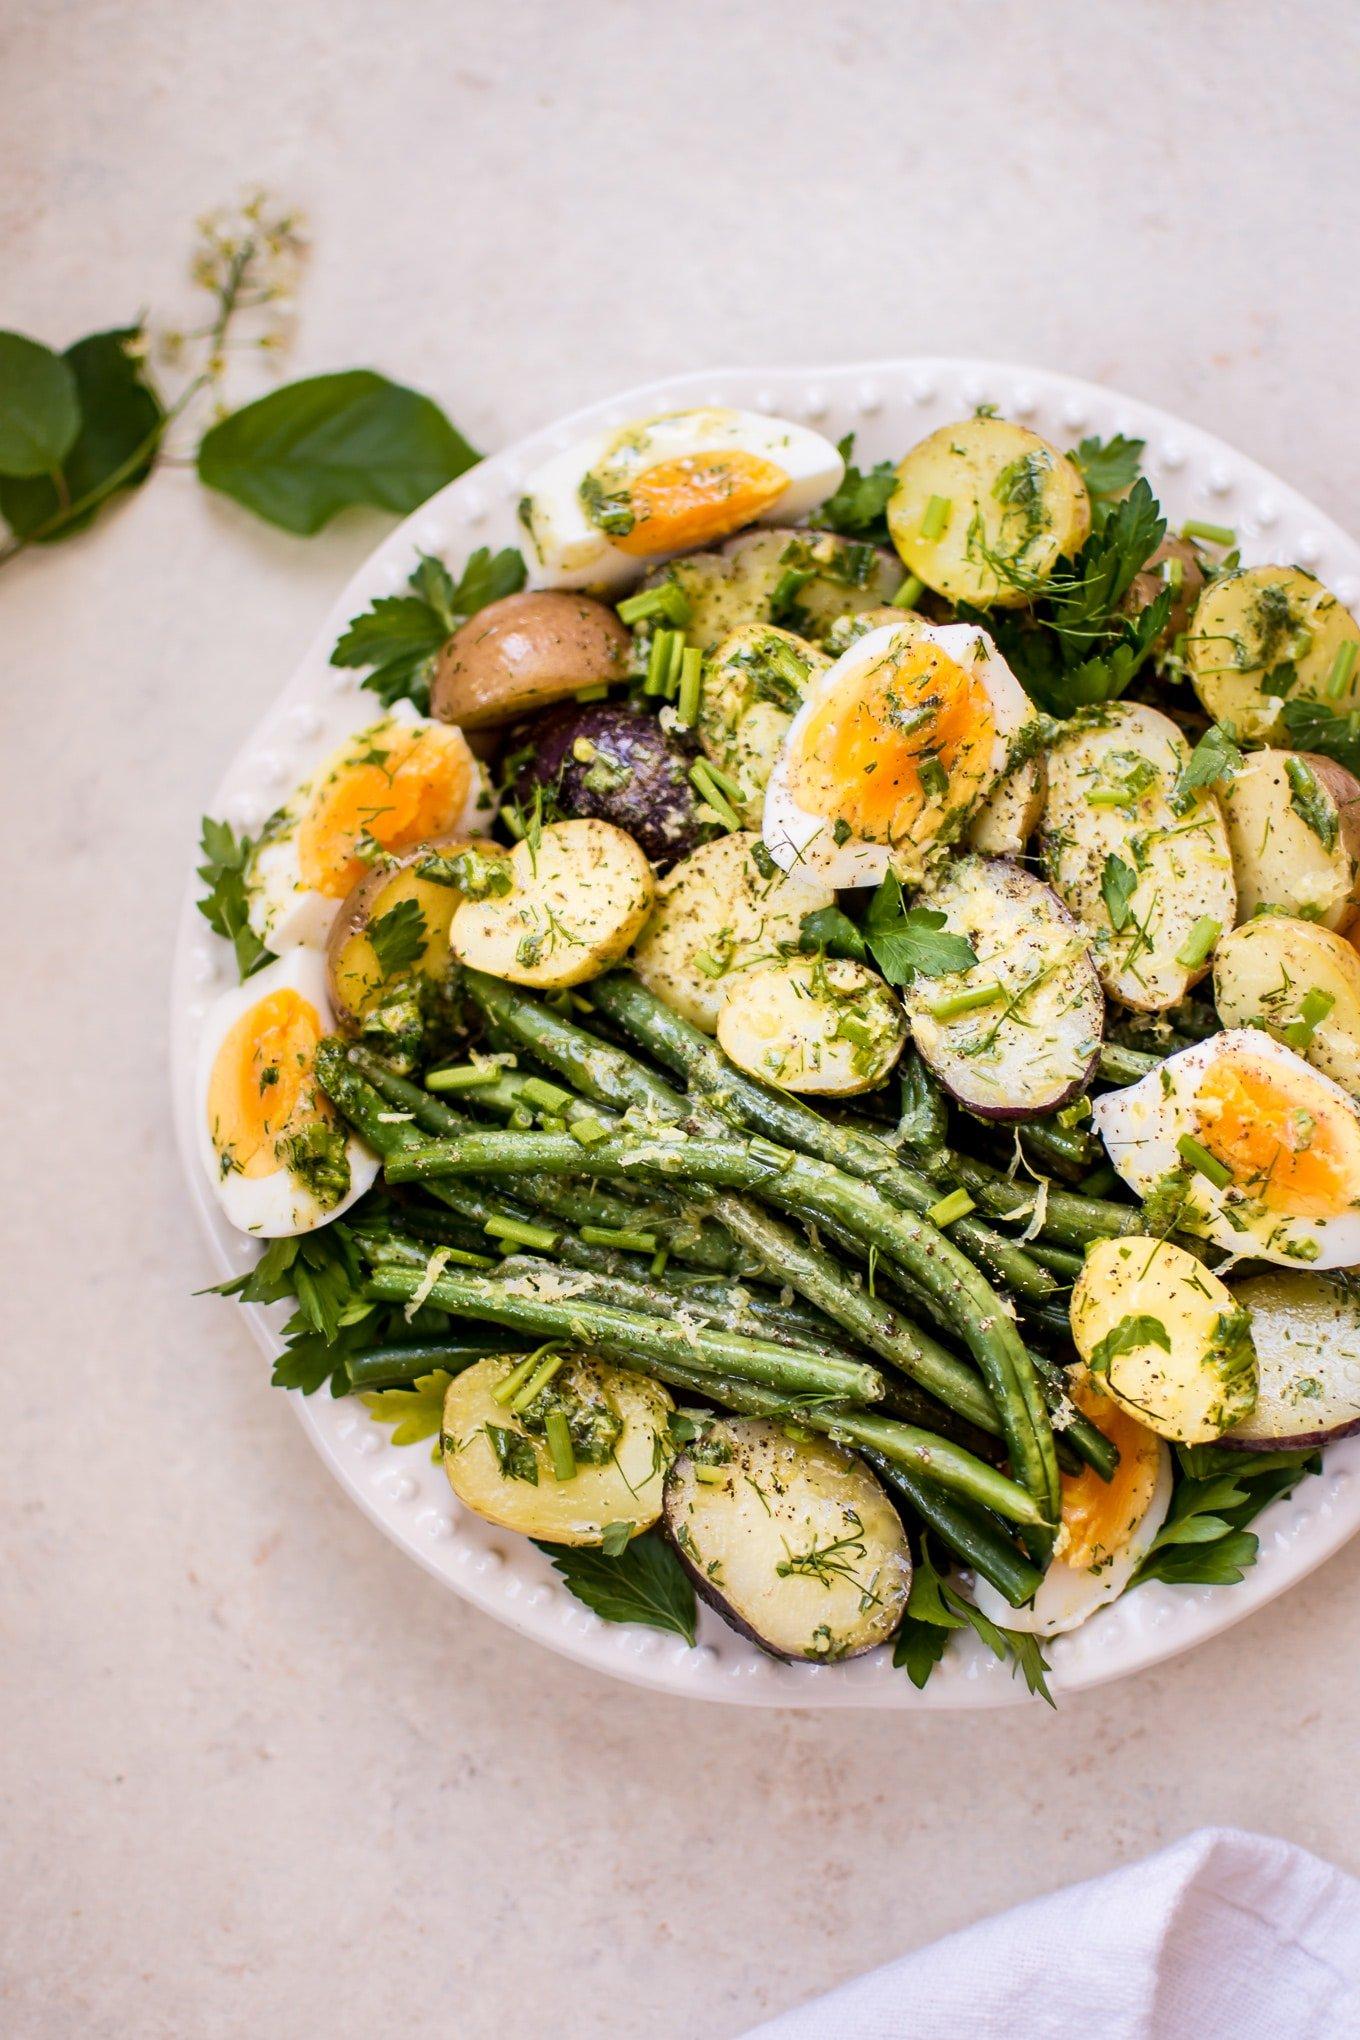 Potato and Green Bean Salad with Eggs • Salt & Lavender